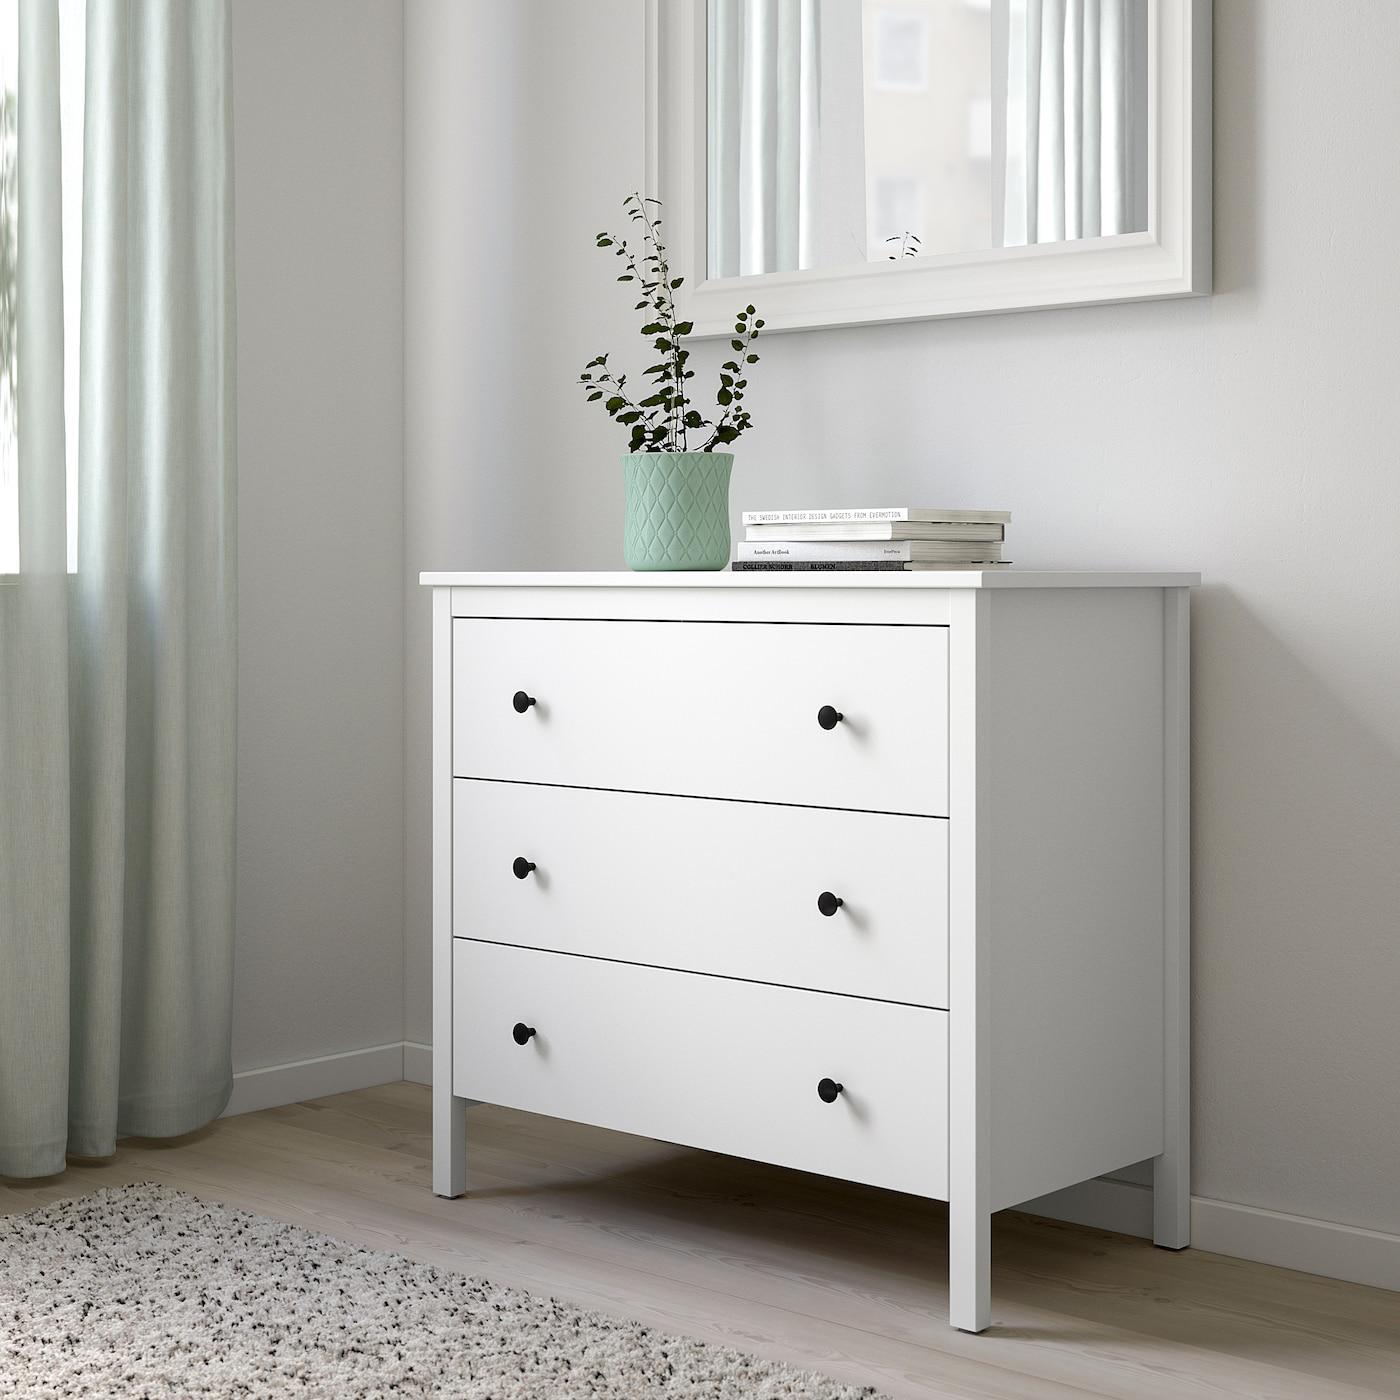 KOPPANG Chest of 3 drawers, white, 90x83 cm